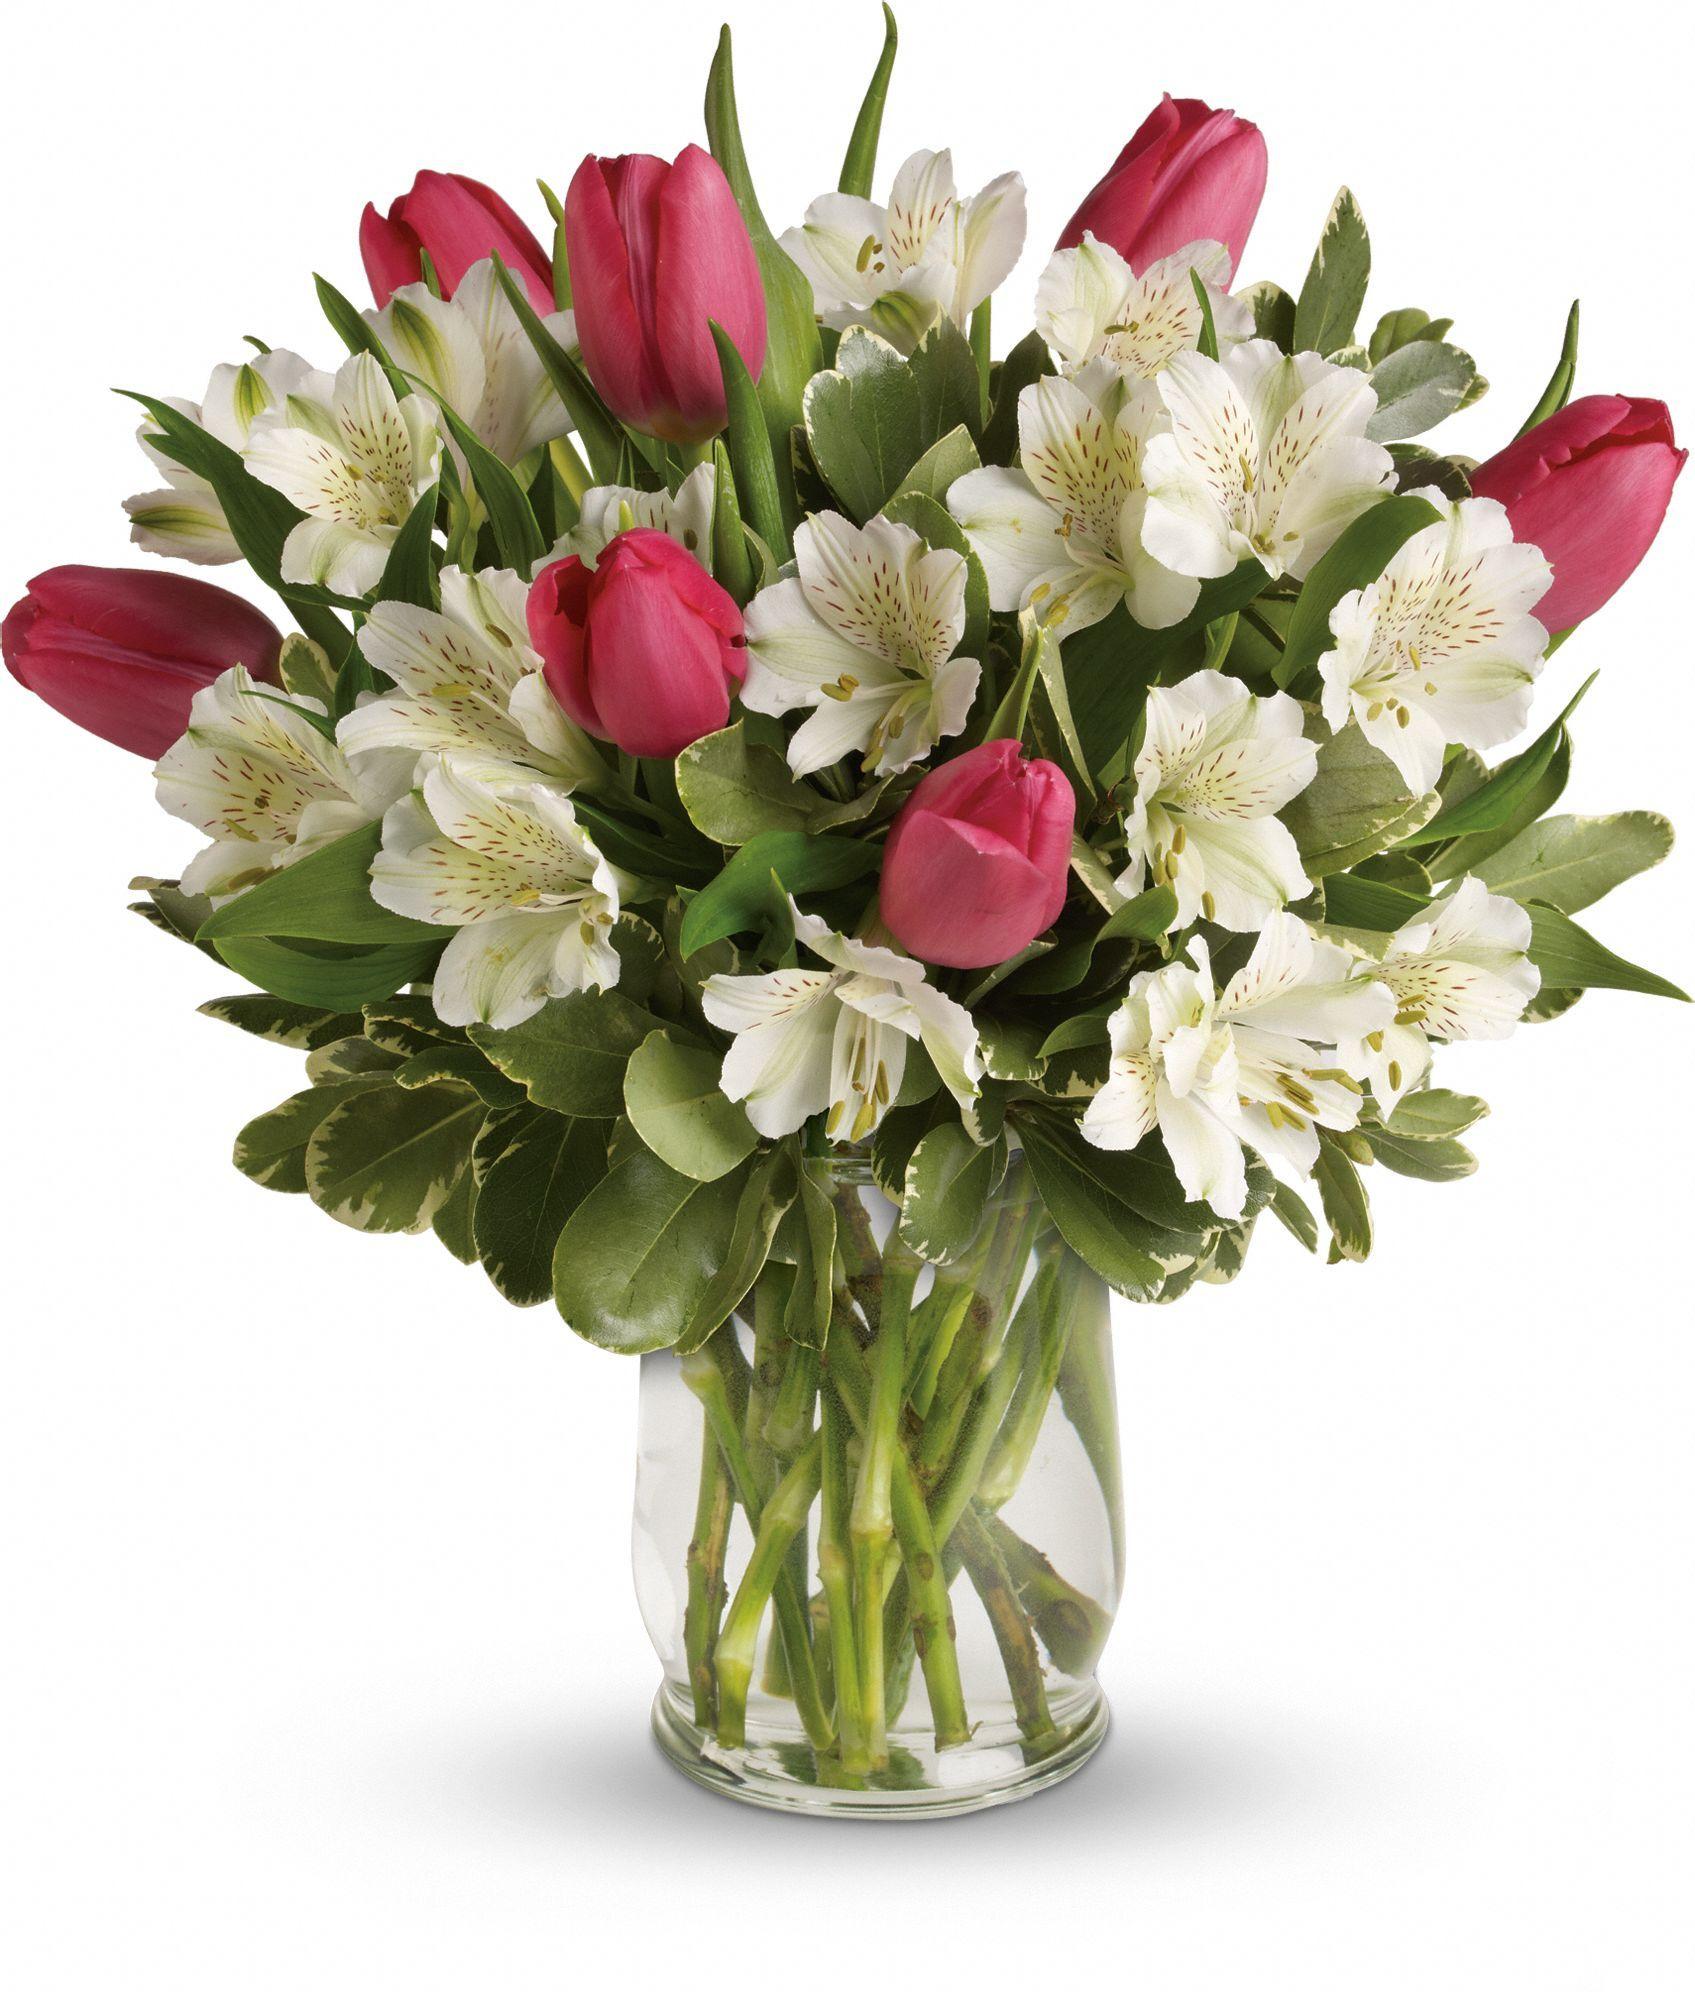 Order Tulip Bouquets Online